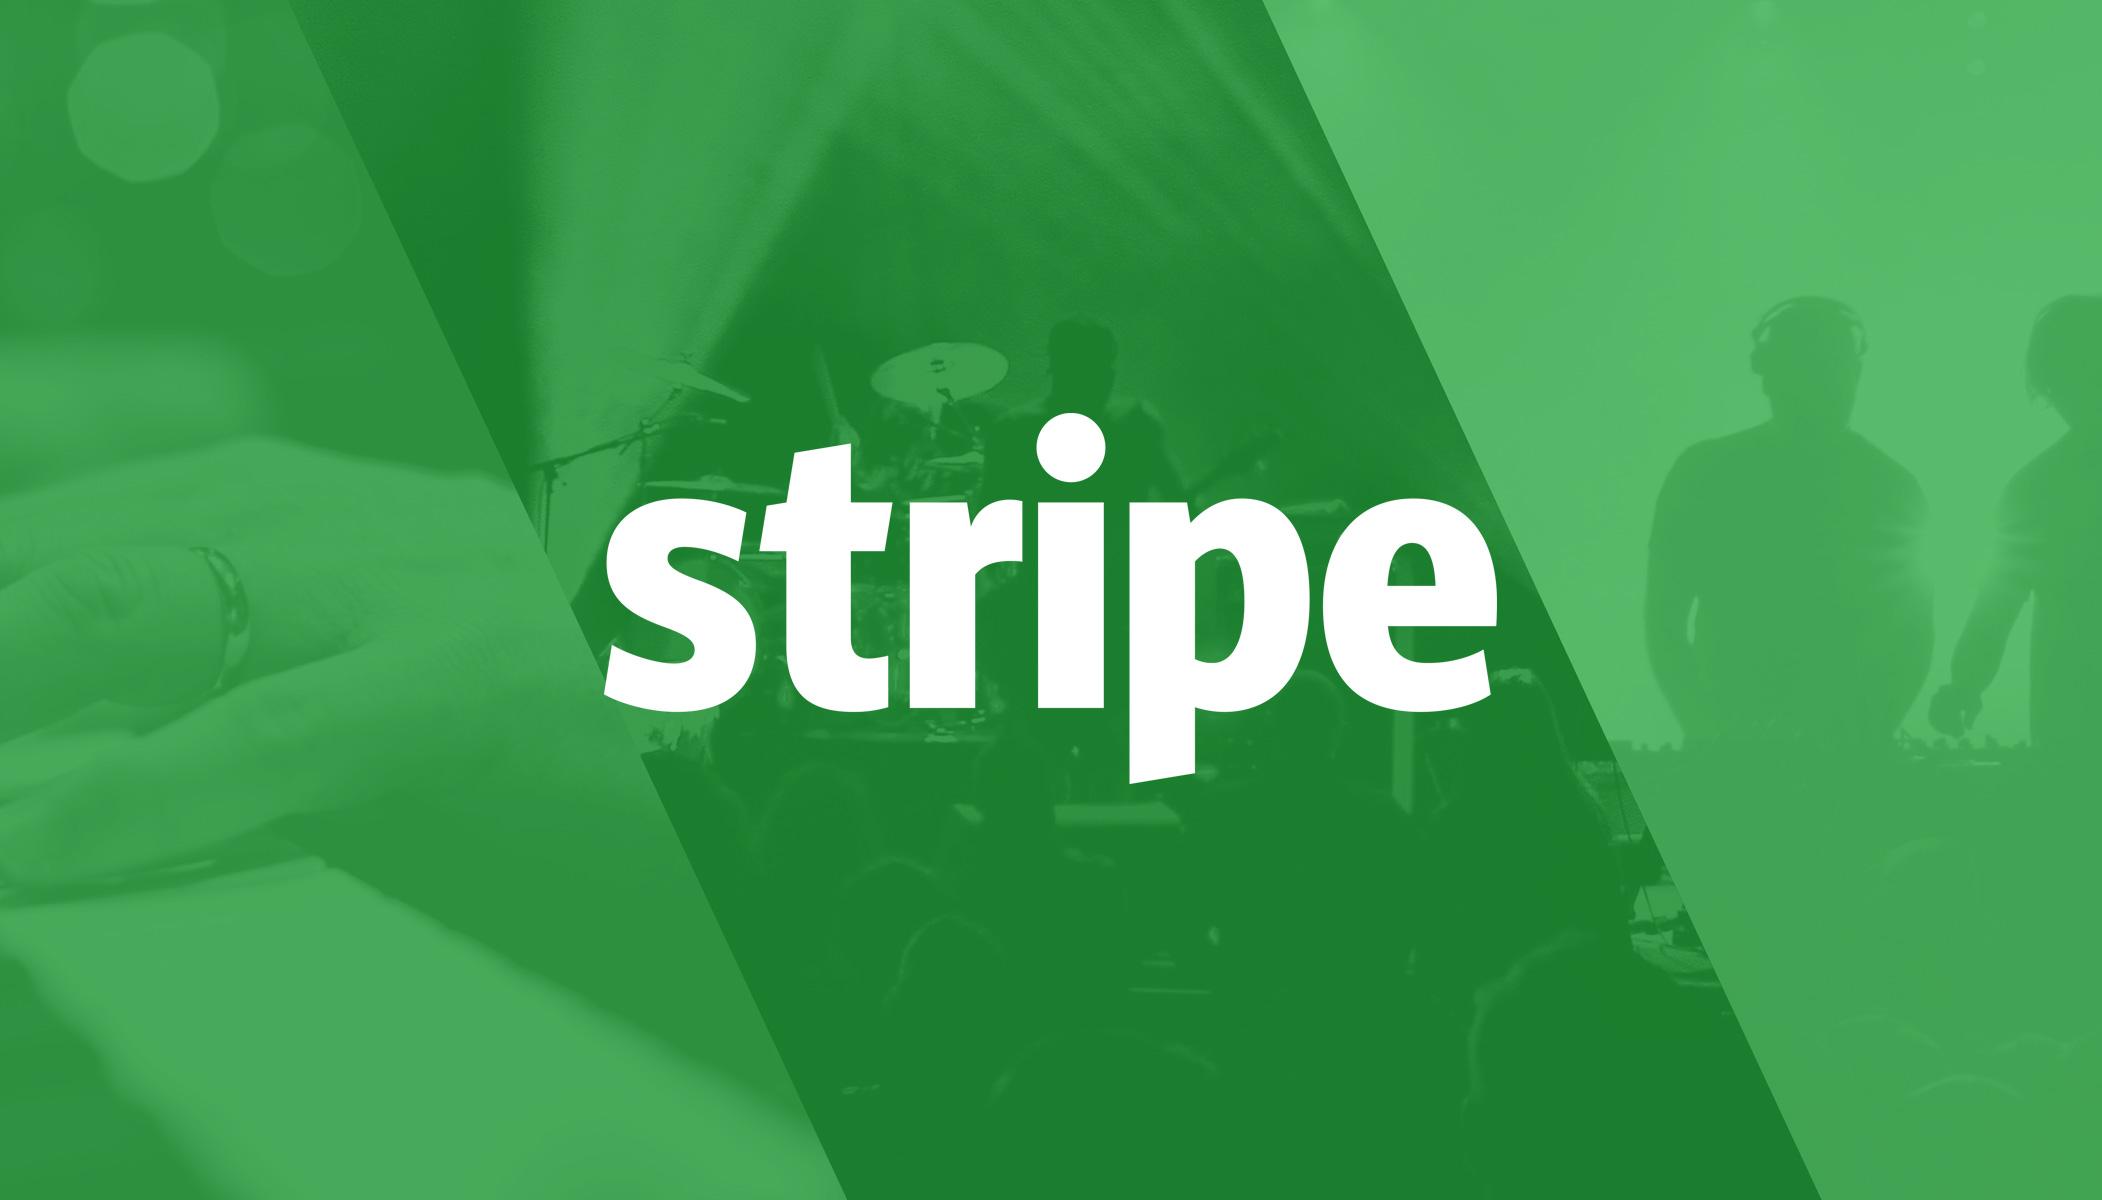 stripe-overture